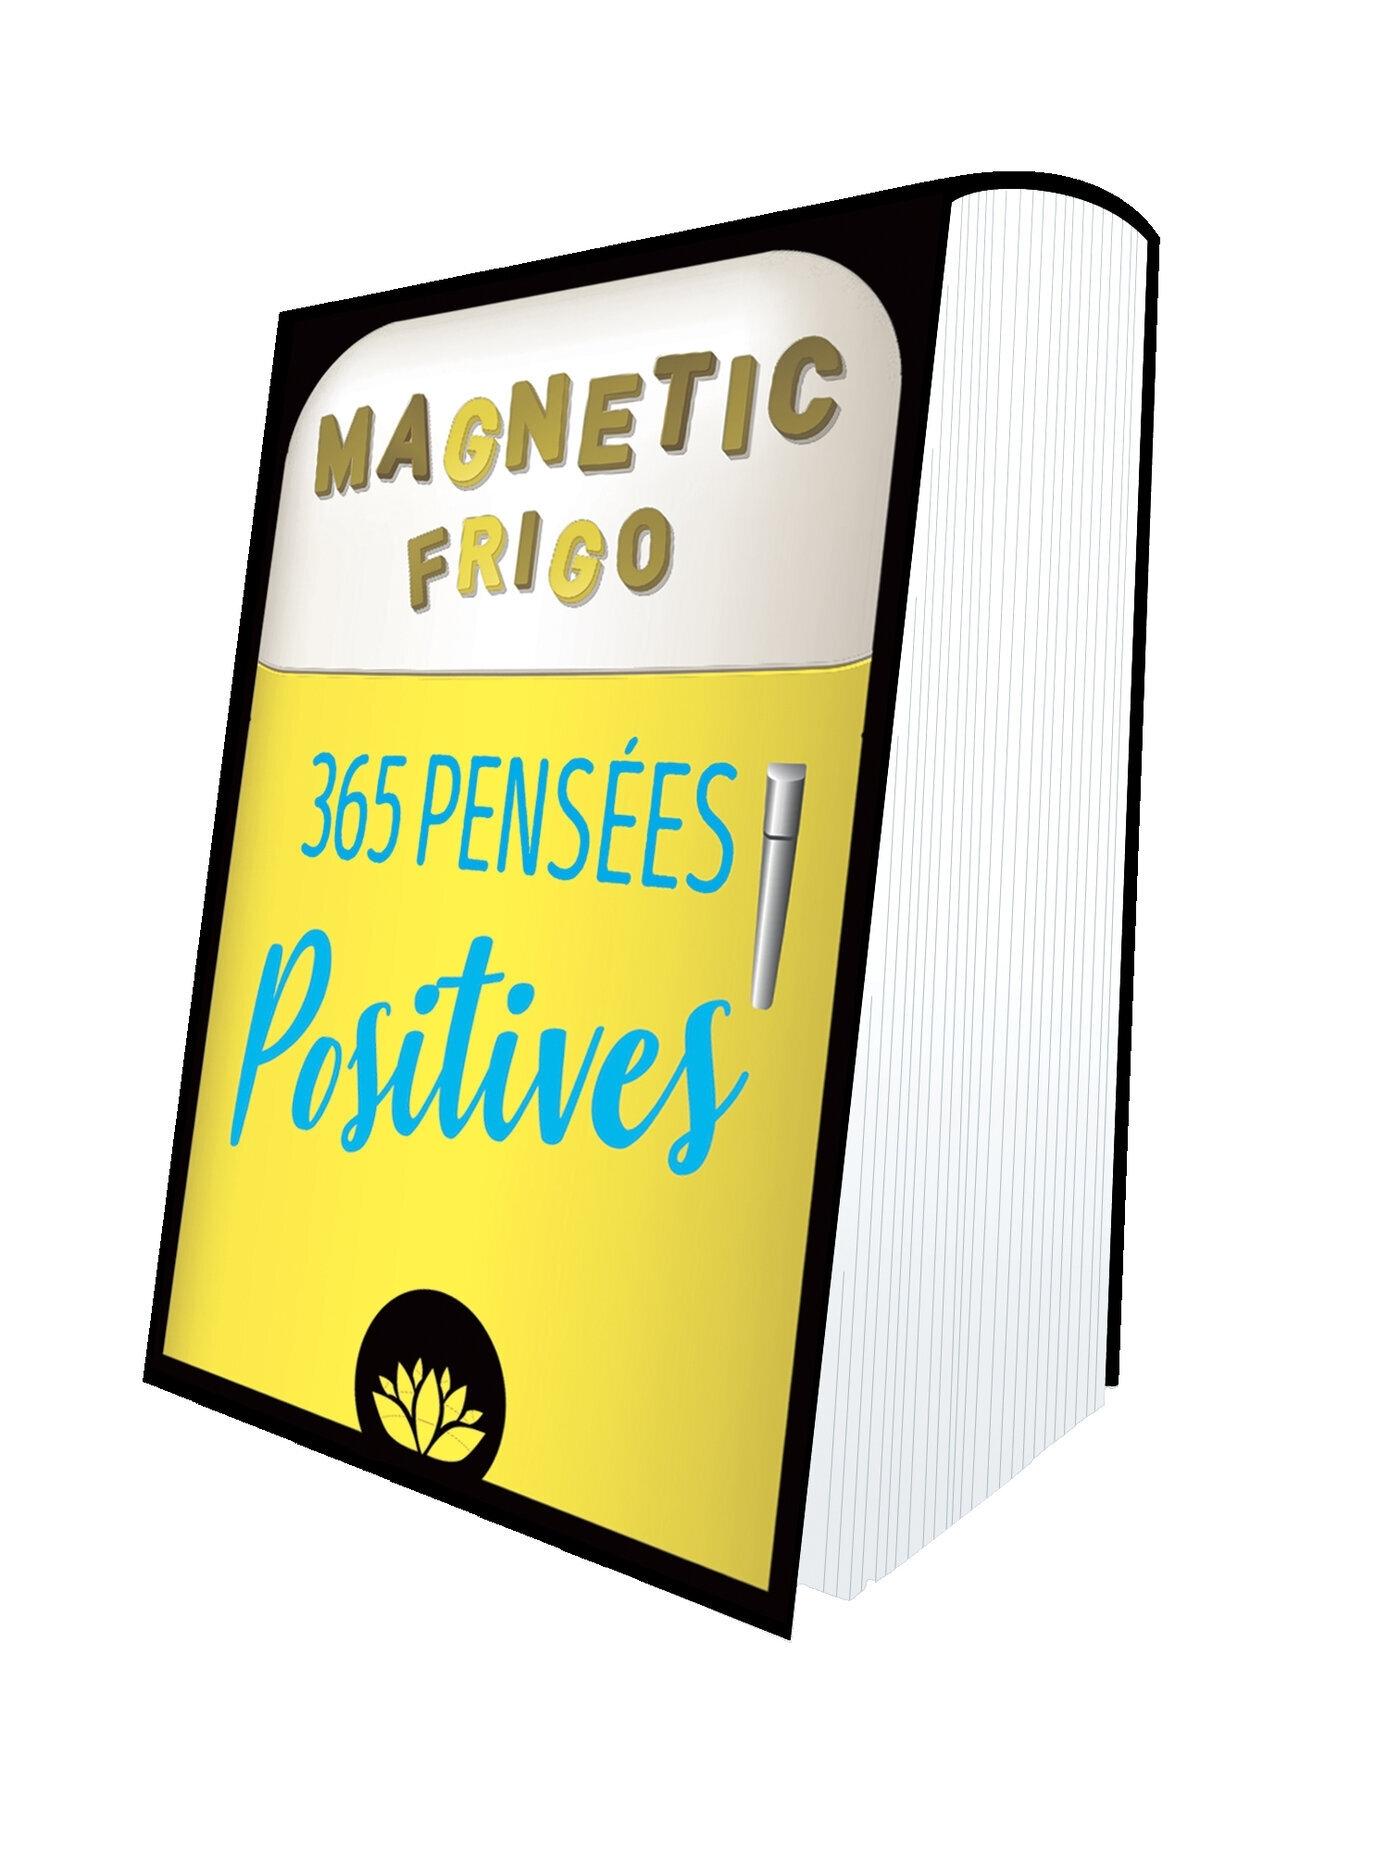 MAGNETIC FRIGO  365 PENSEES POSITIVES